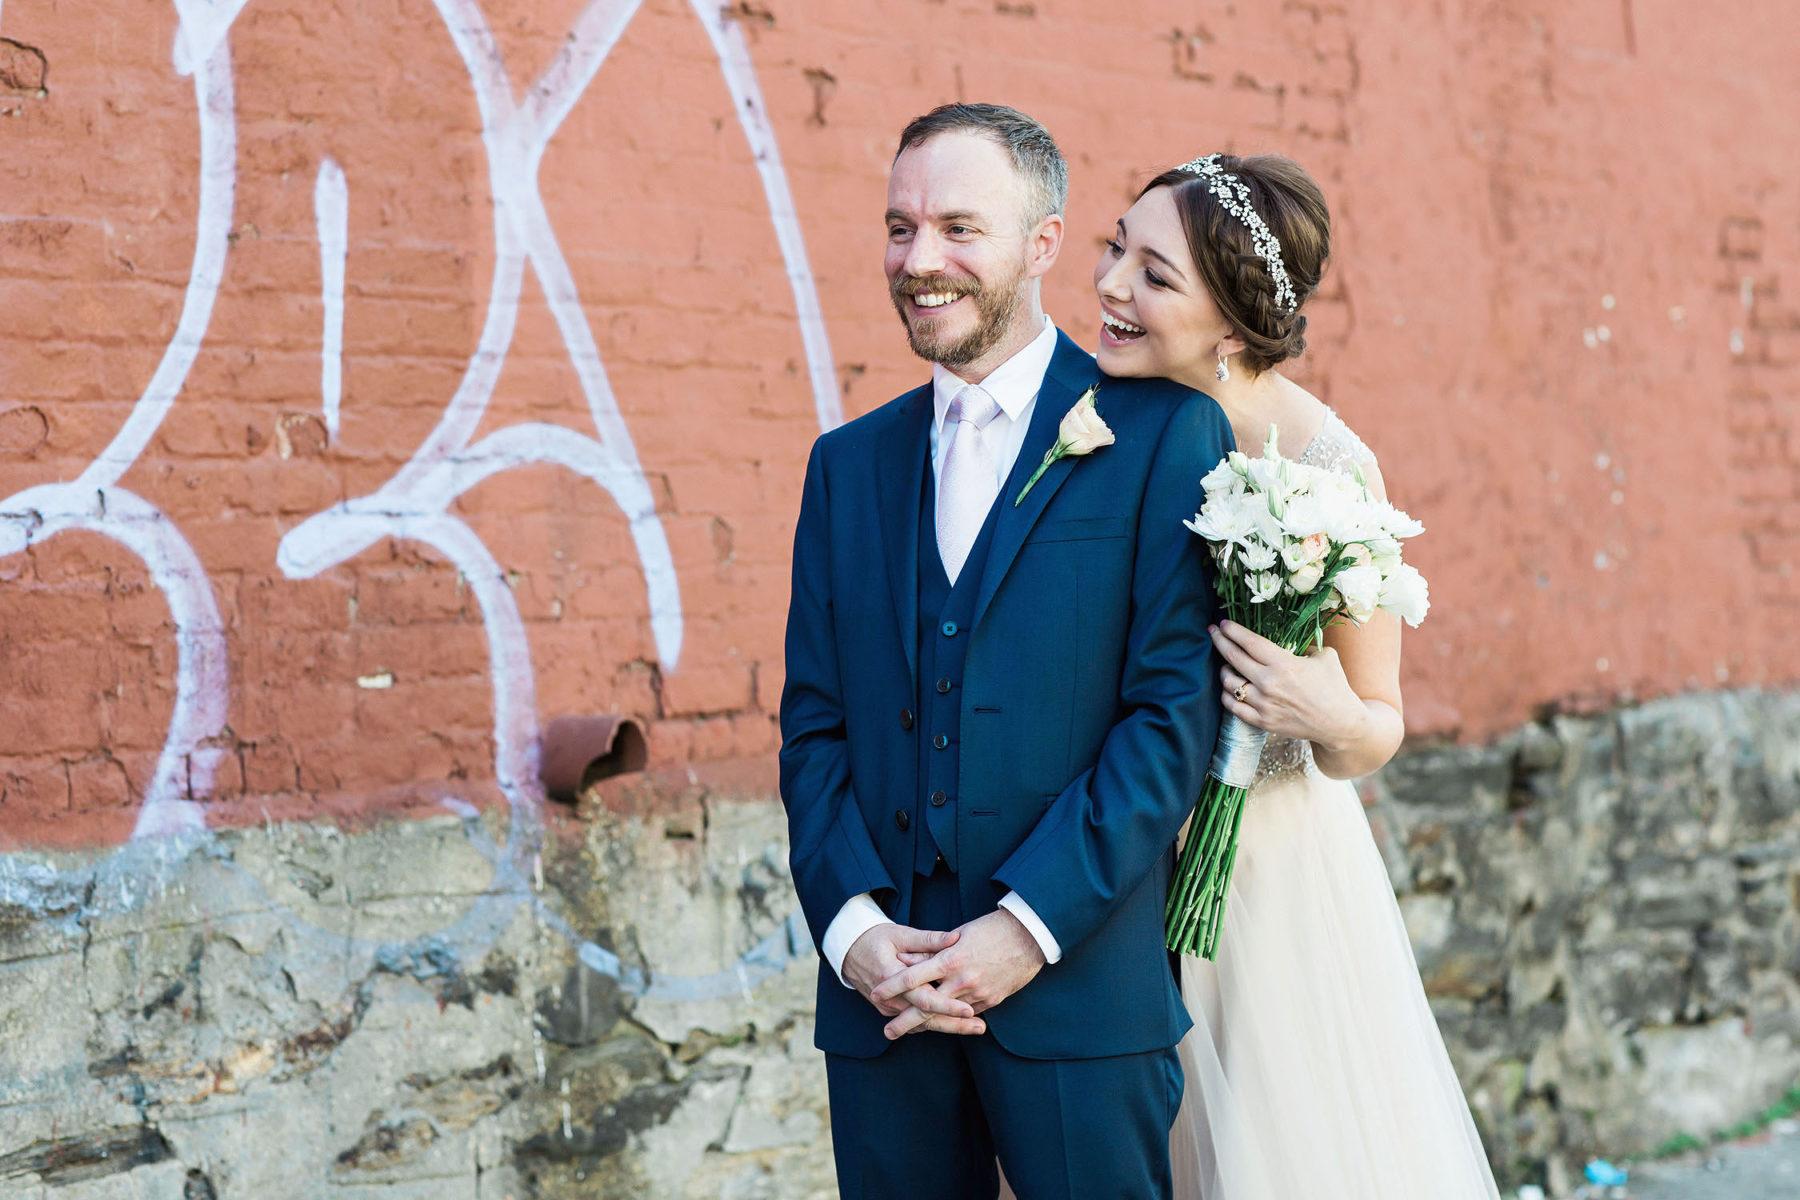 Sweet Wedding First Looks - Rad Brooklyn Wedding Photographers